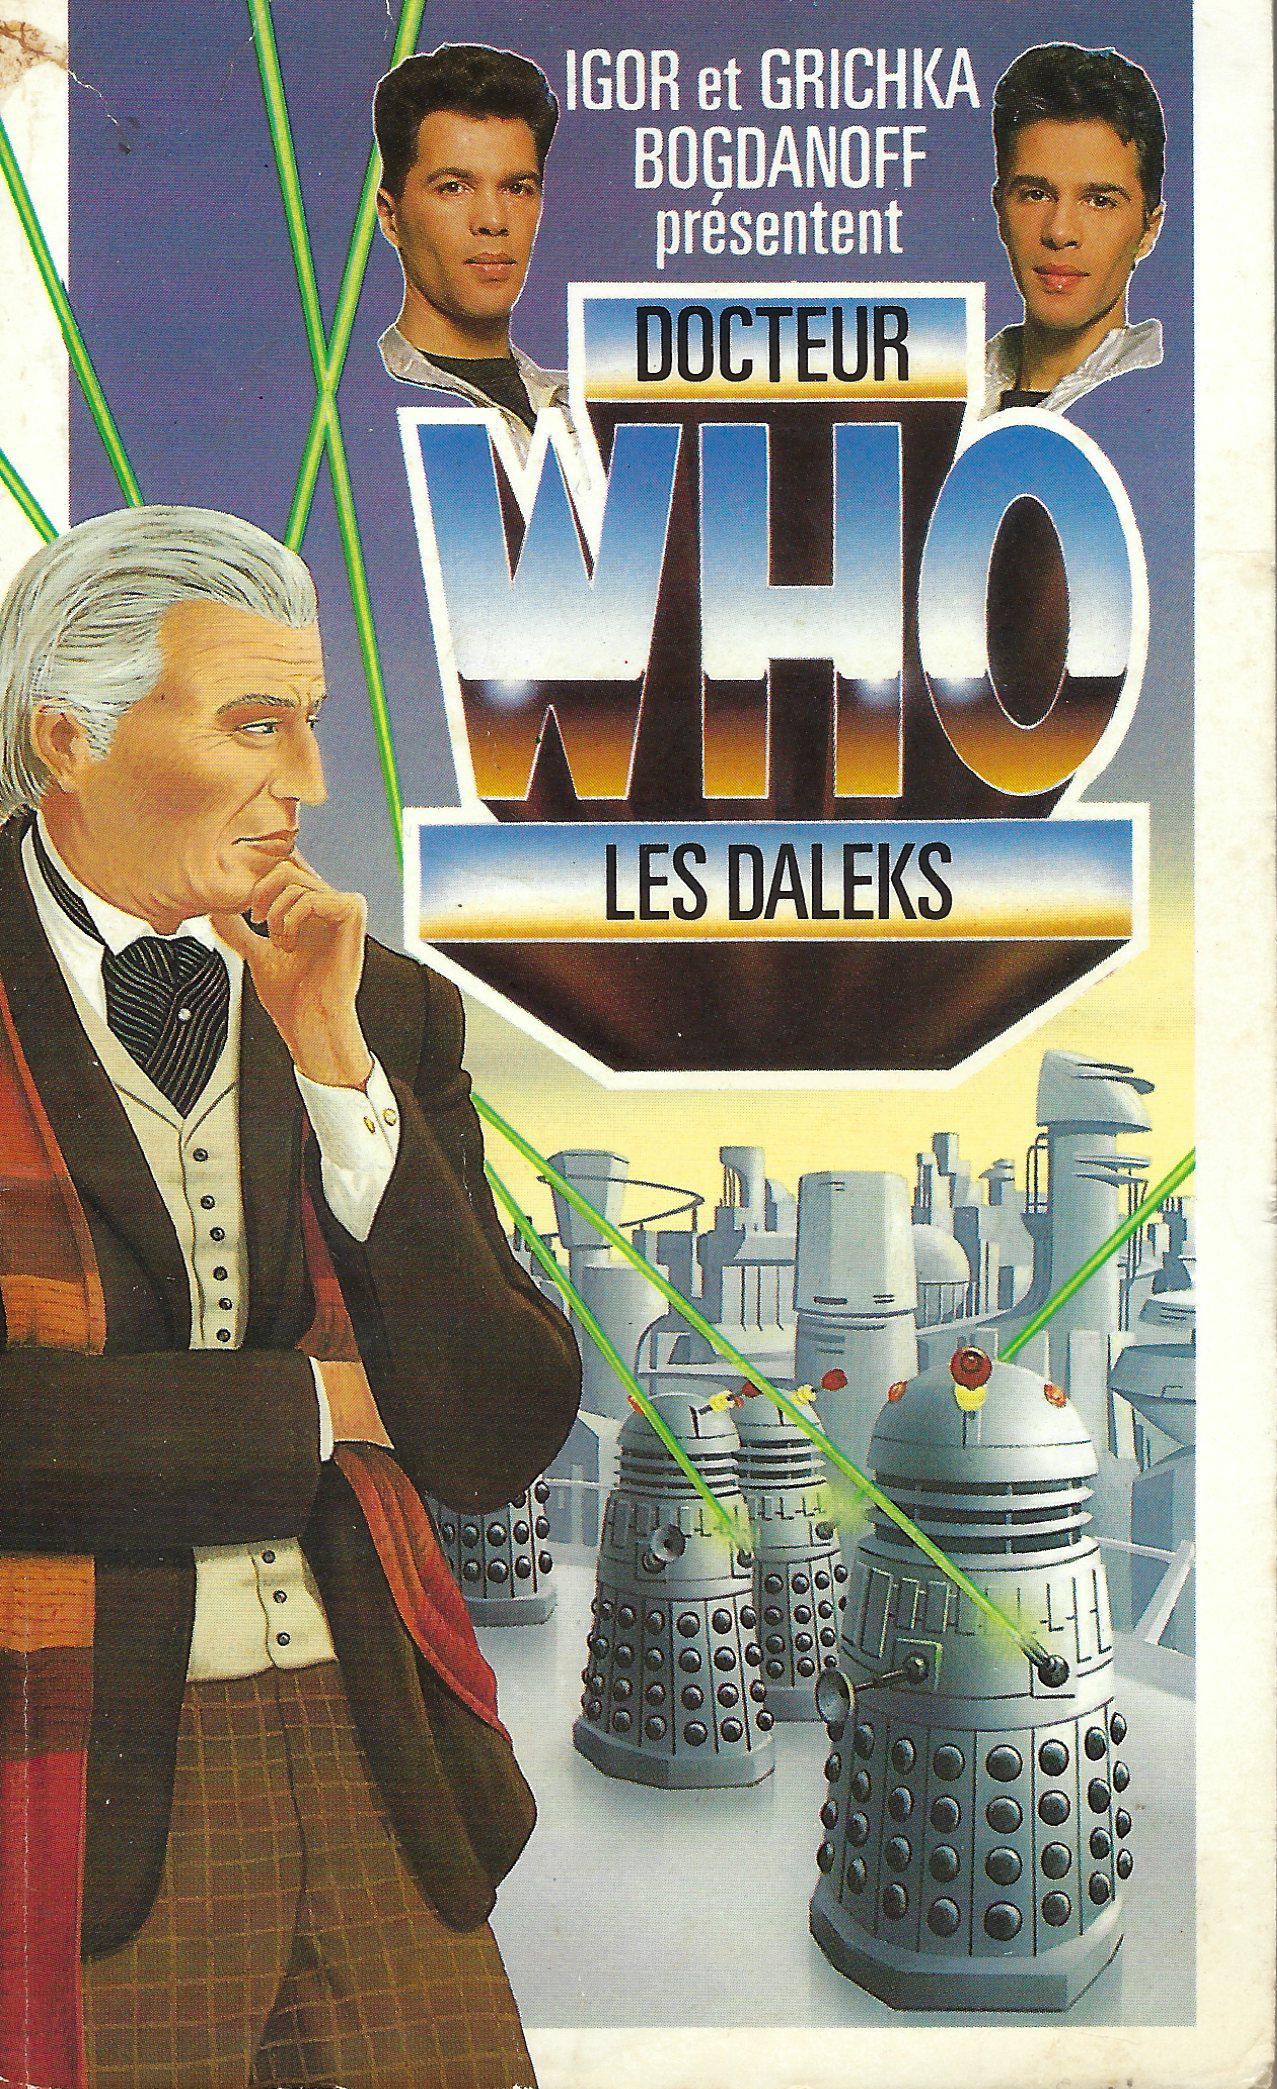 File:France The Daleks cover.jpg